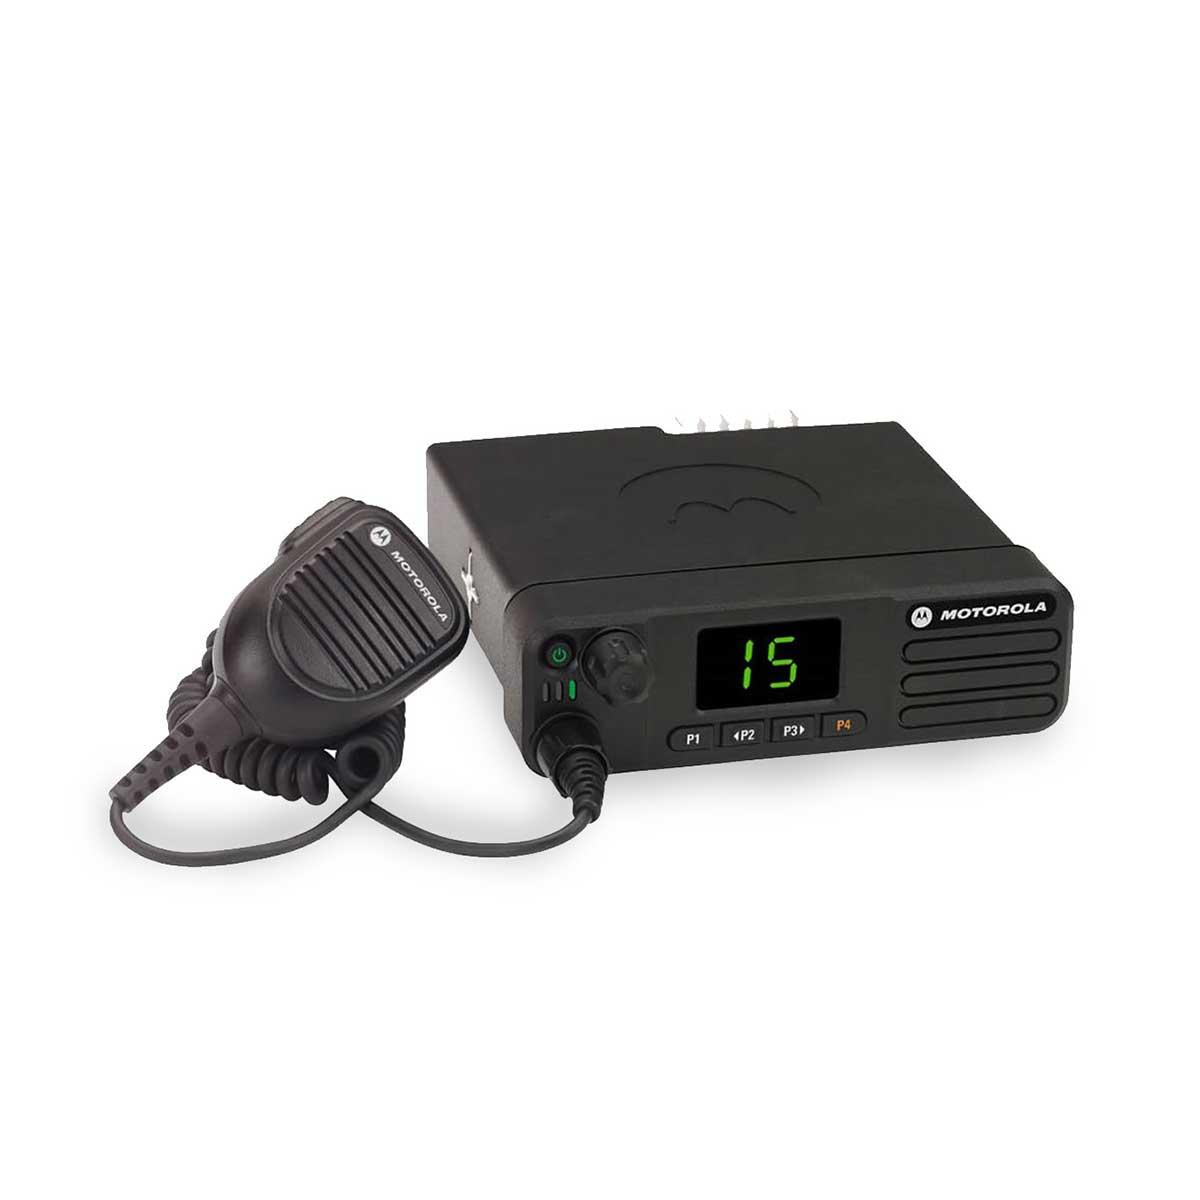 Radio Motorola DGM8000 Digital LAM28JQC9KA1AN VHF 136-174MHZ de 45W